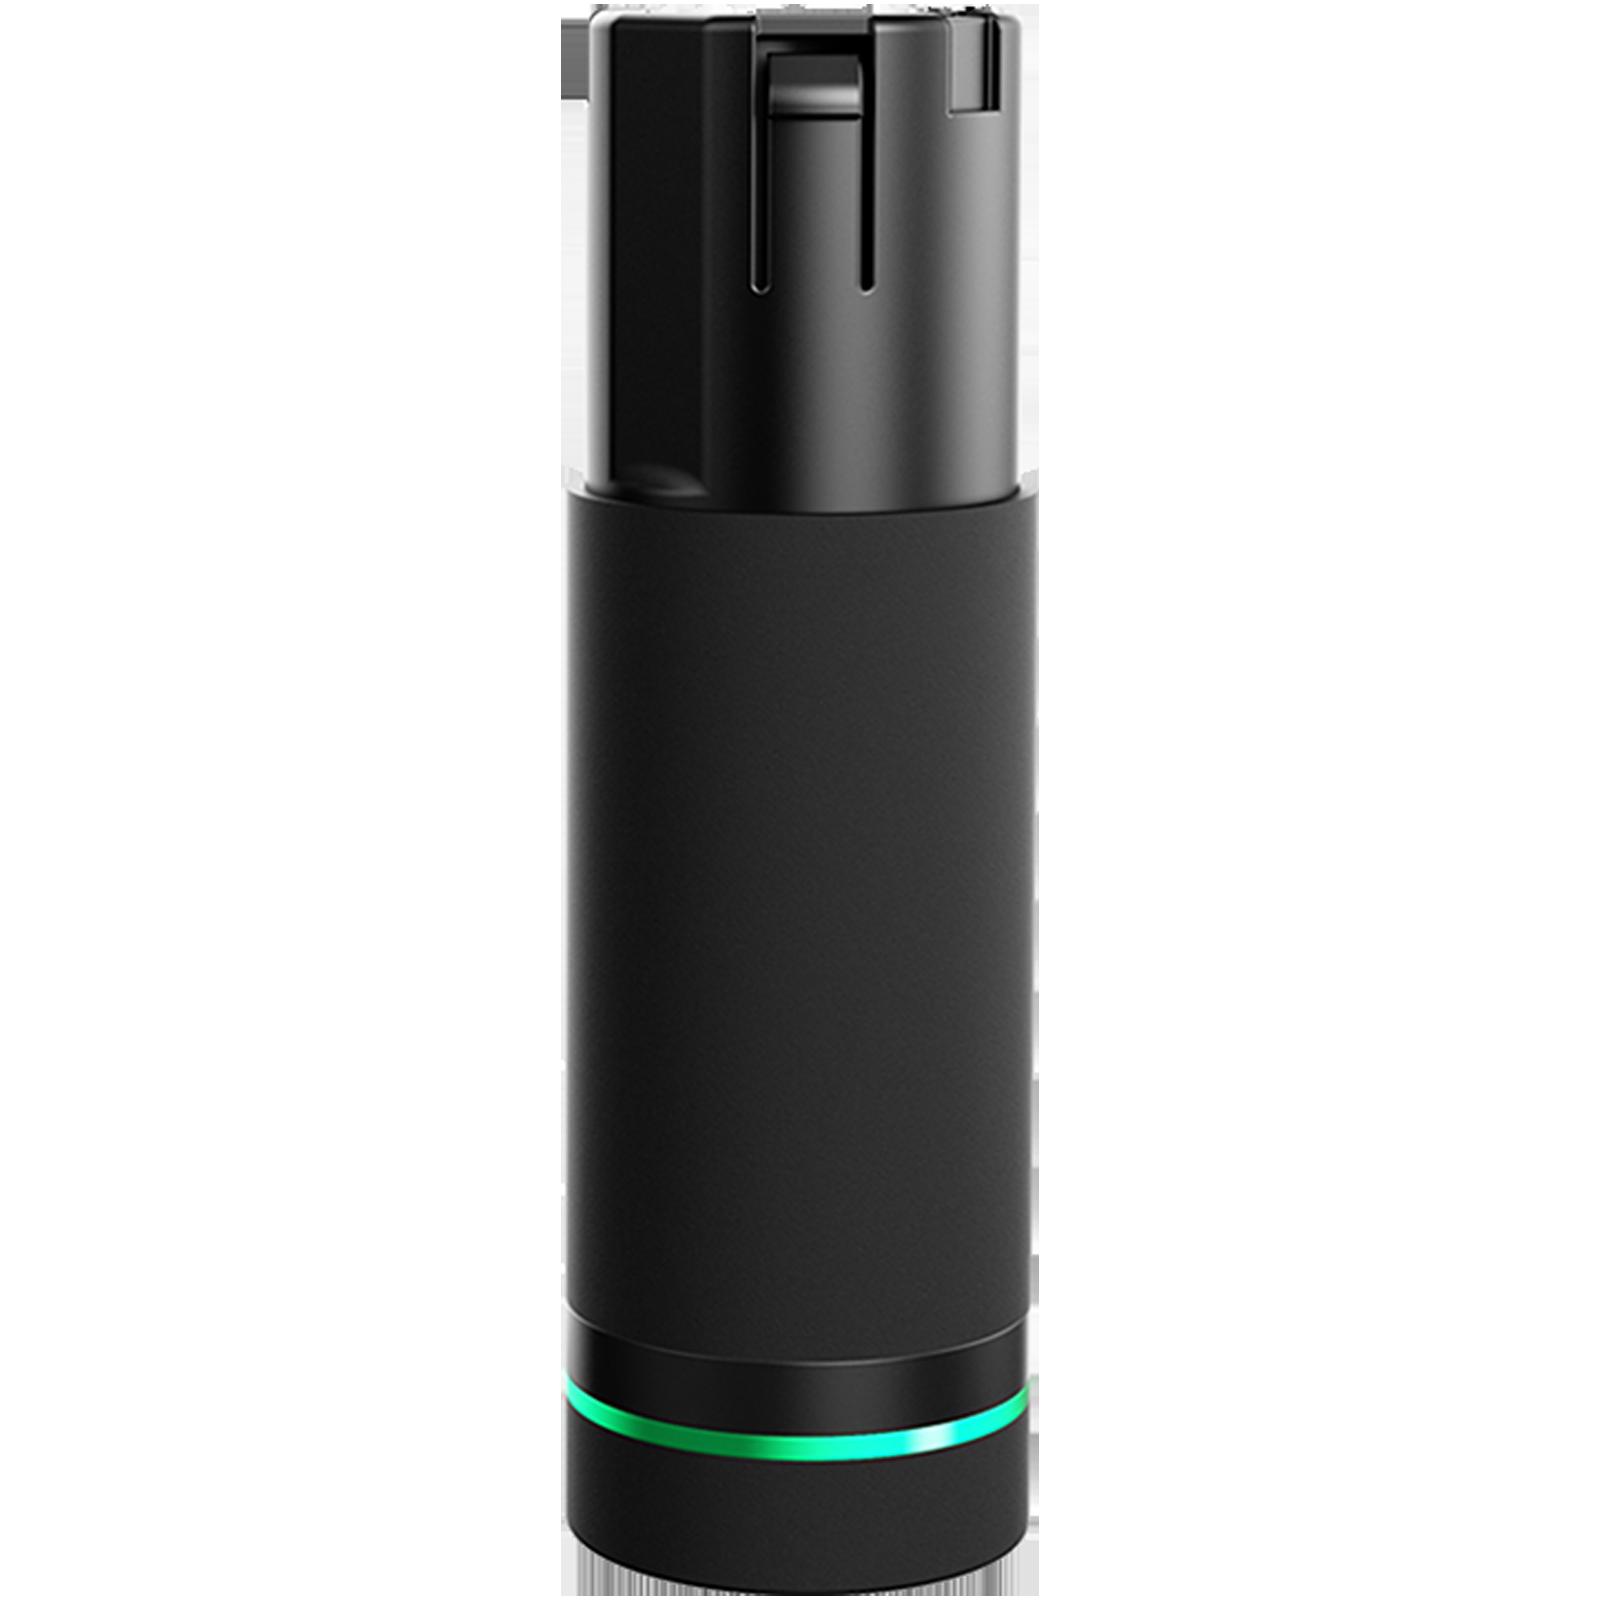 Hyperice Hypervolt Rechargeable Battery (Battery Level Indicator, 101086, Black)_1